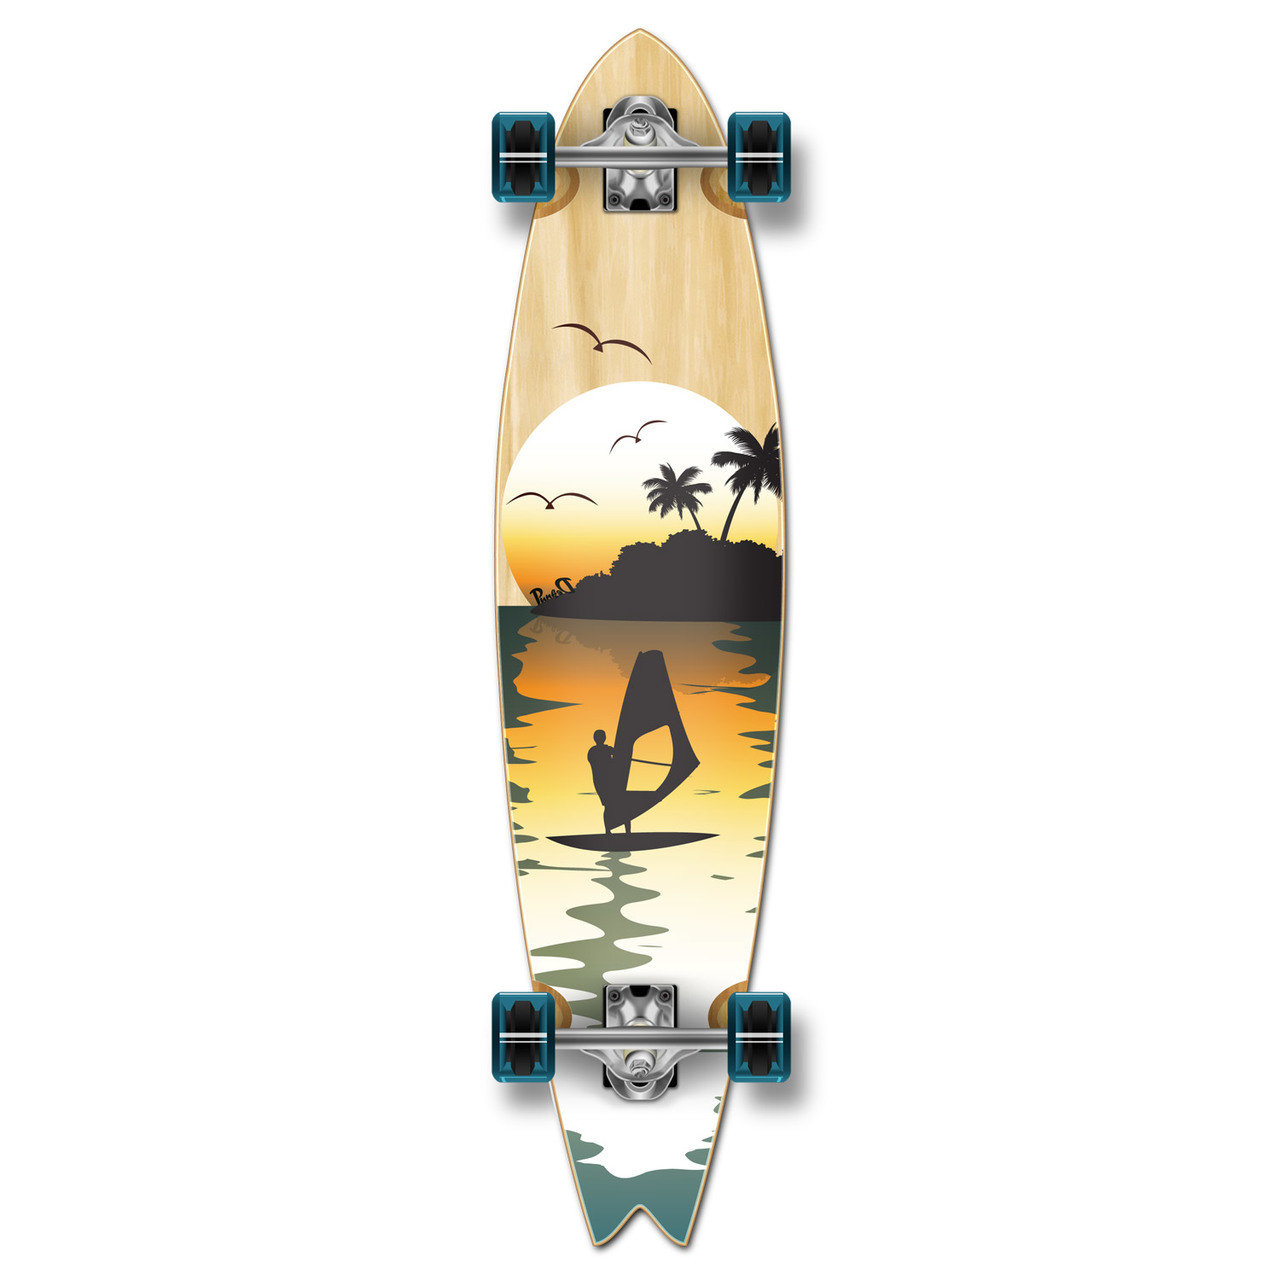 Surfer - Fishtail